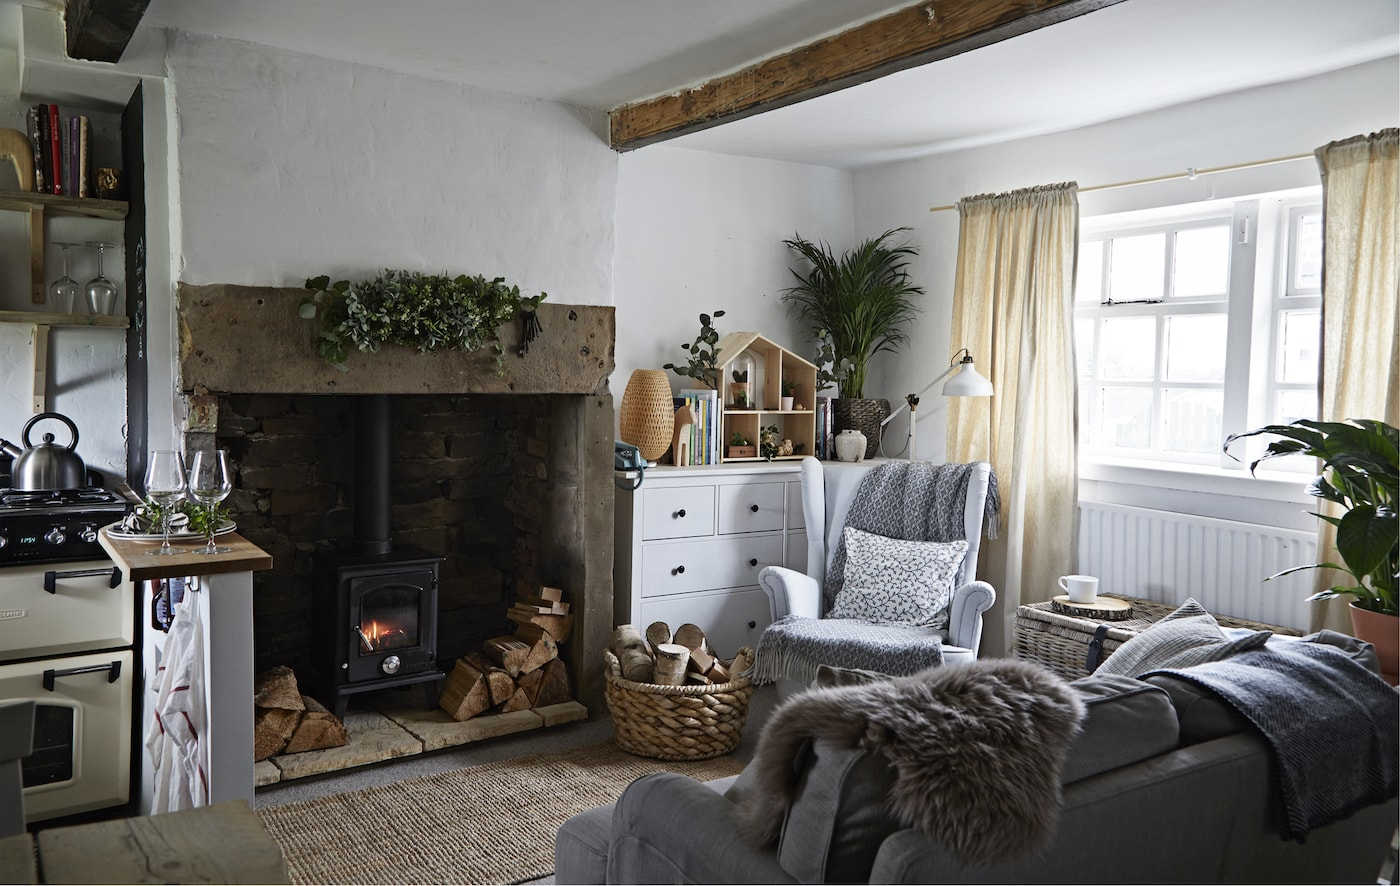 Sala decorada num estilo rústico